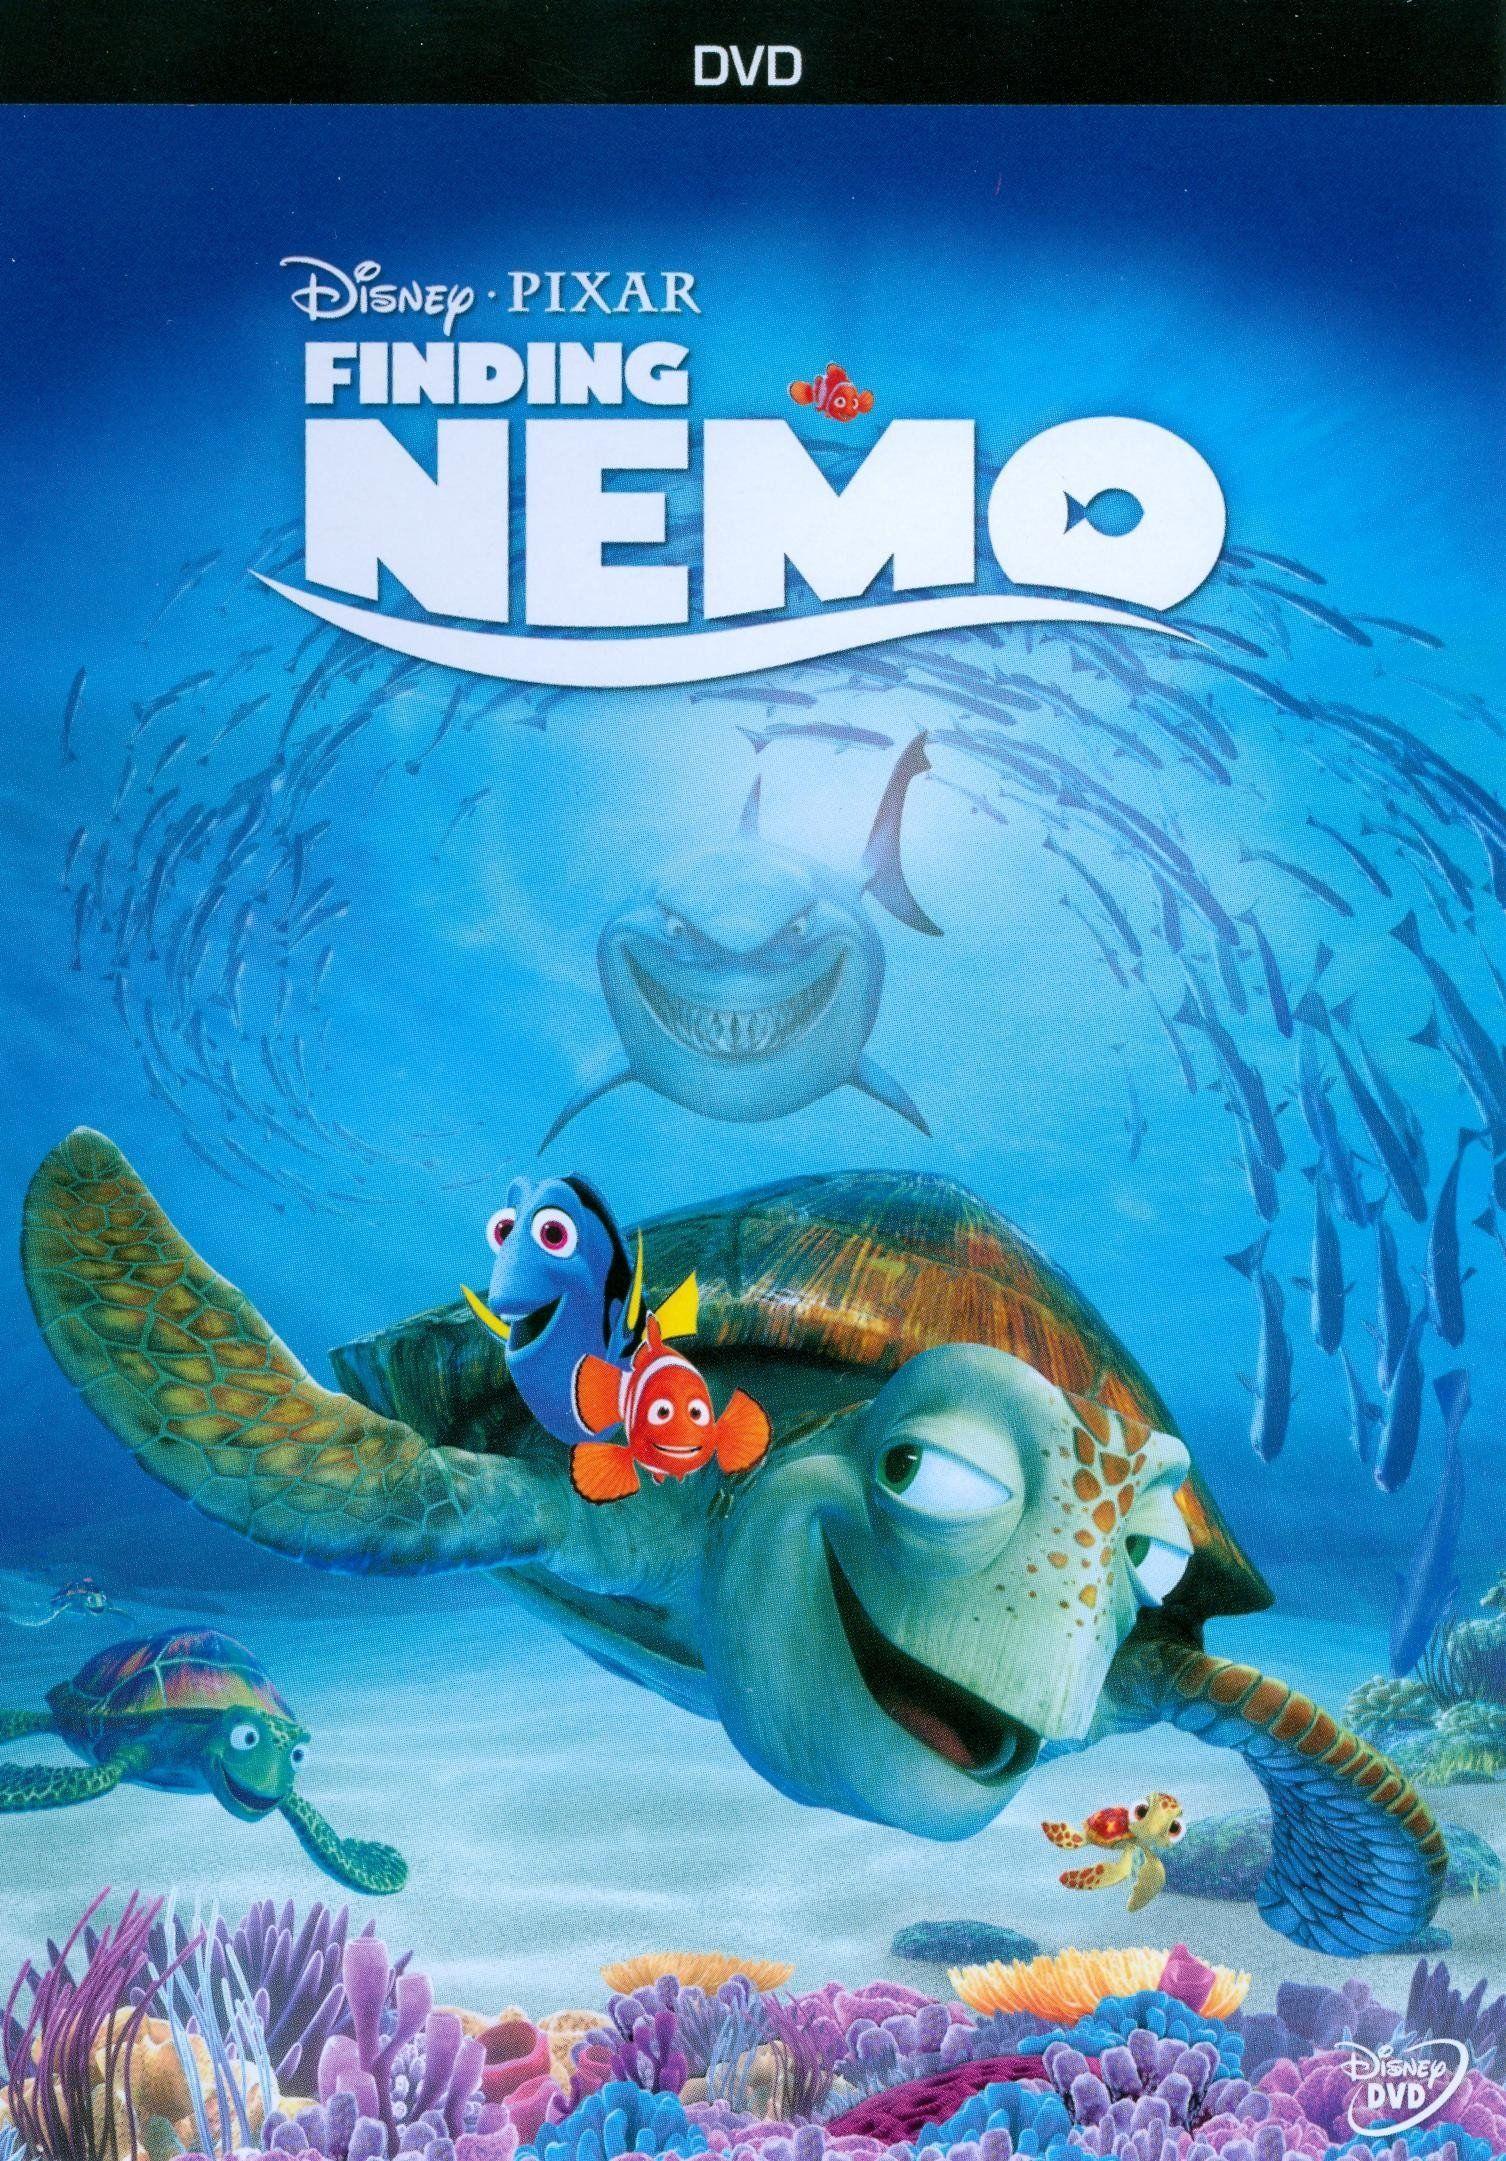 Finding Nemo Ecology Worksheet Answers Worksheet Finding Nemo 3d In 2020 Finding Nemo Movie Finding Nemo Dvd Nemo Movie